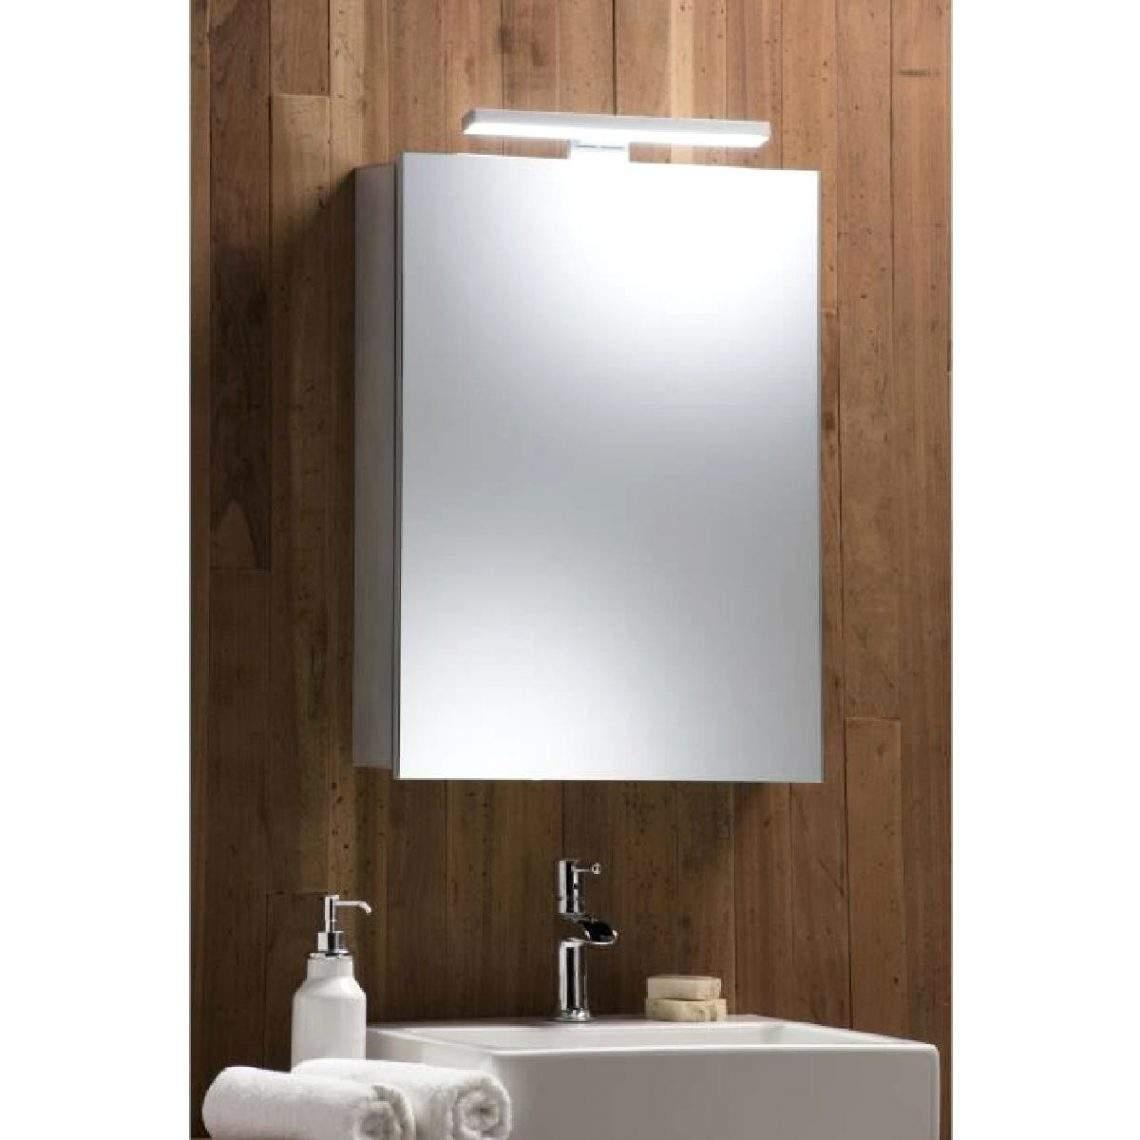 Armoire De toilette Miroir Castorama Beau Galerie Armoires De toilettes Castorama Good Armoire toilette Miroir